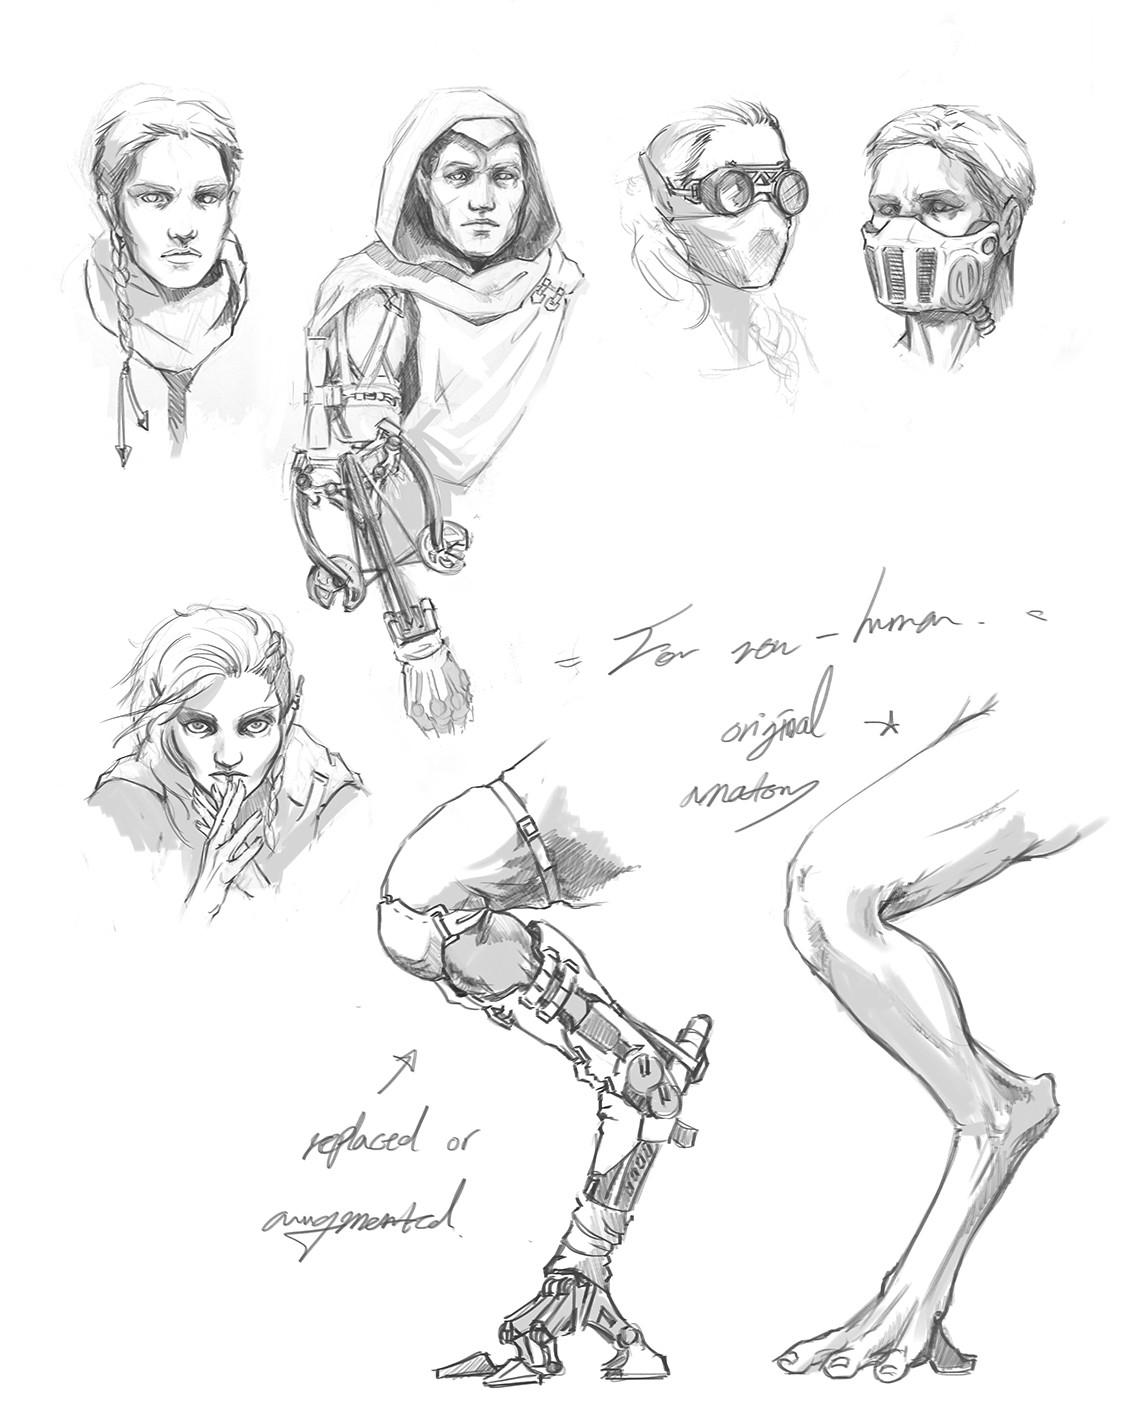 Yun nam sci fan general sketch sheet 72